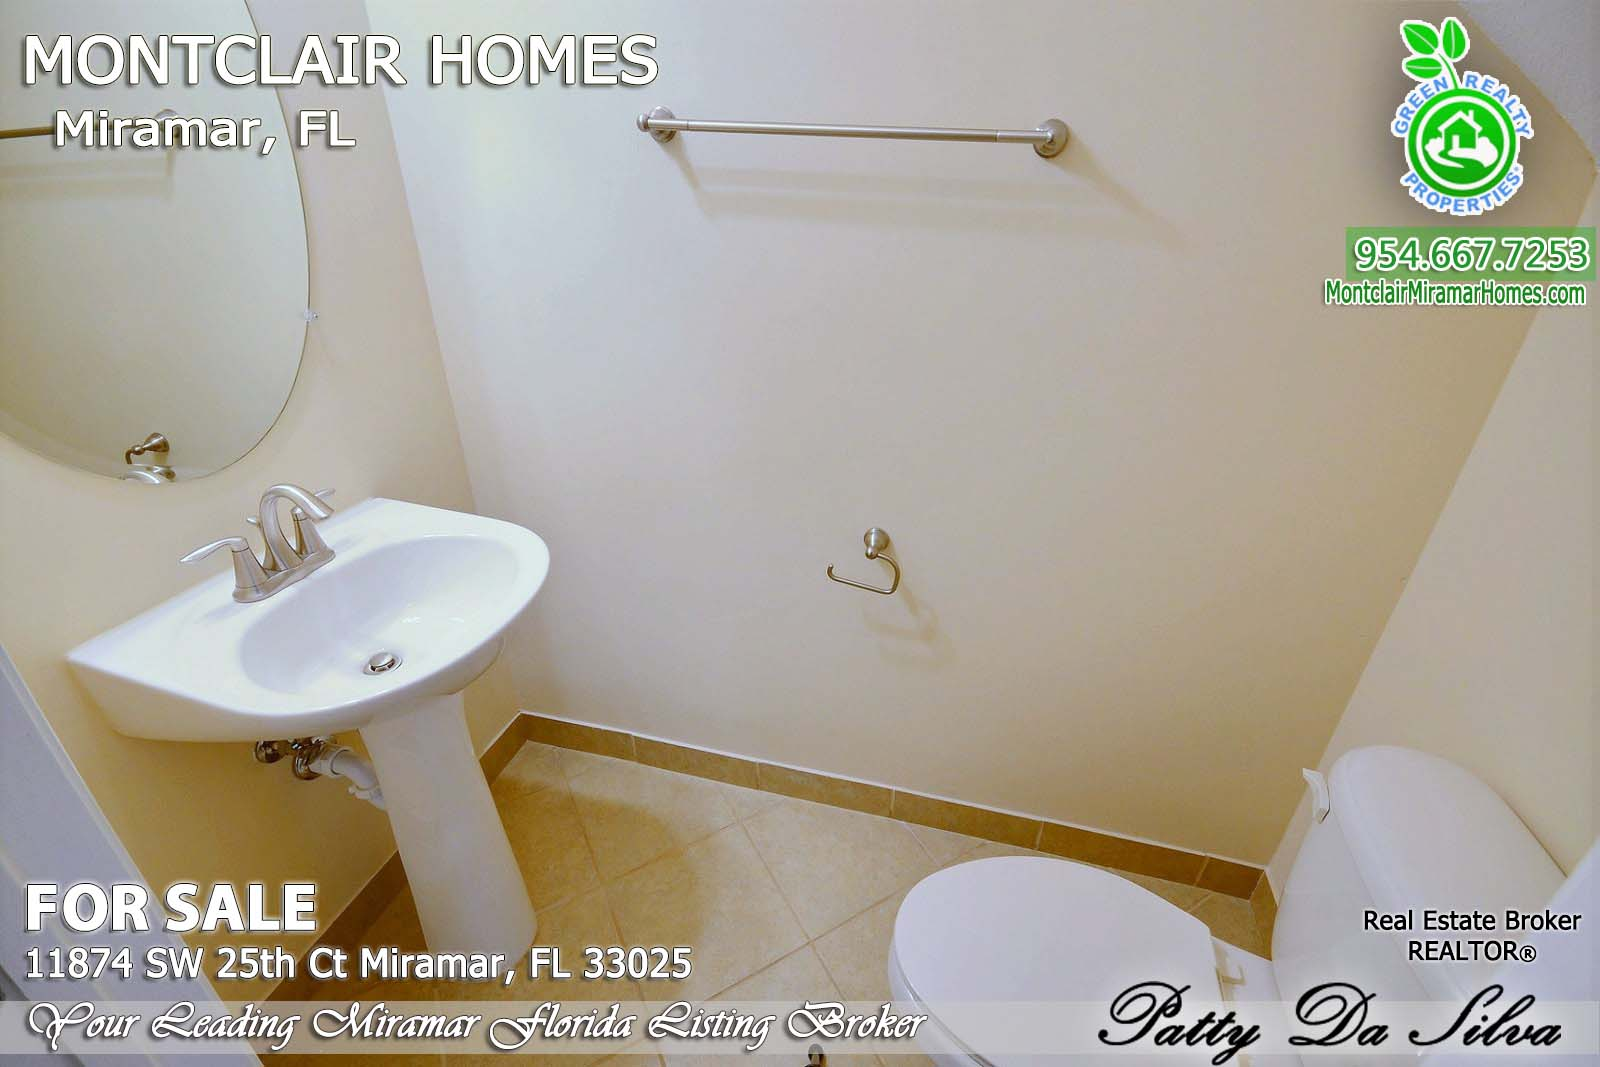 11874 SW 25 CT, Miramar FL 33025 - Montclair (11) - Copy